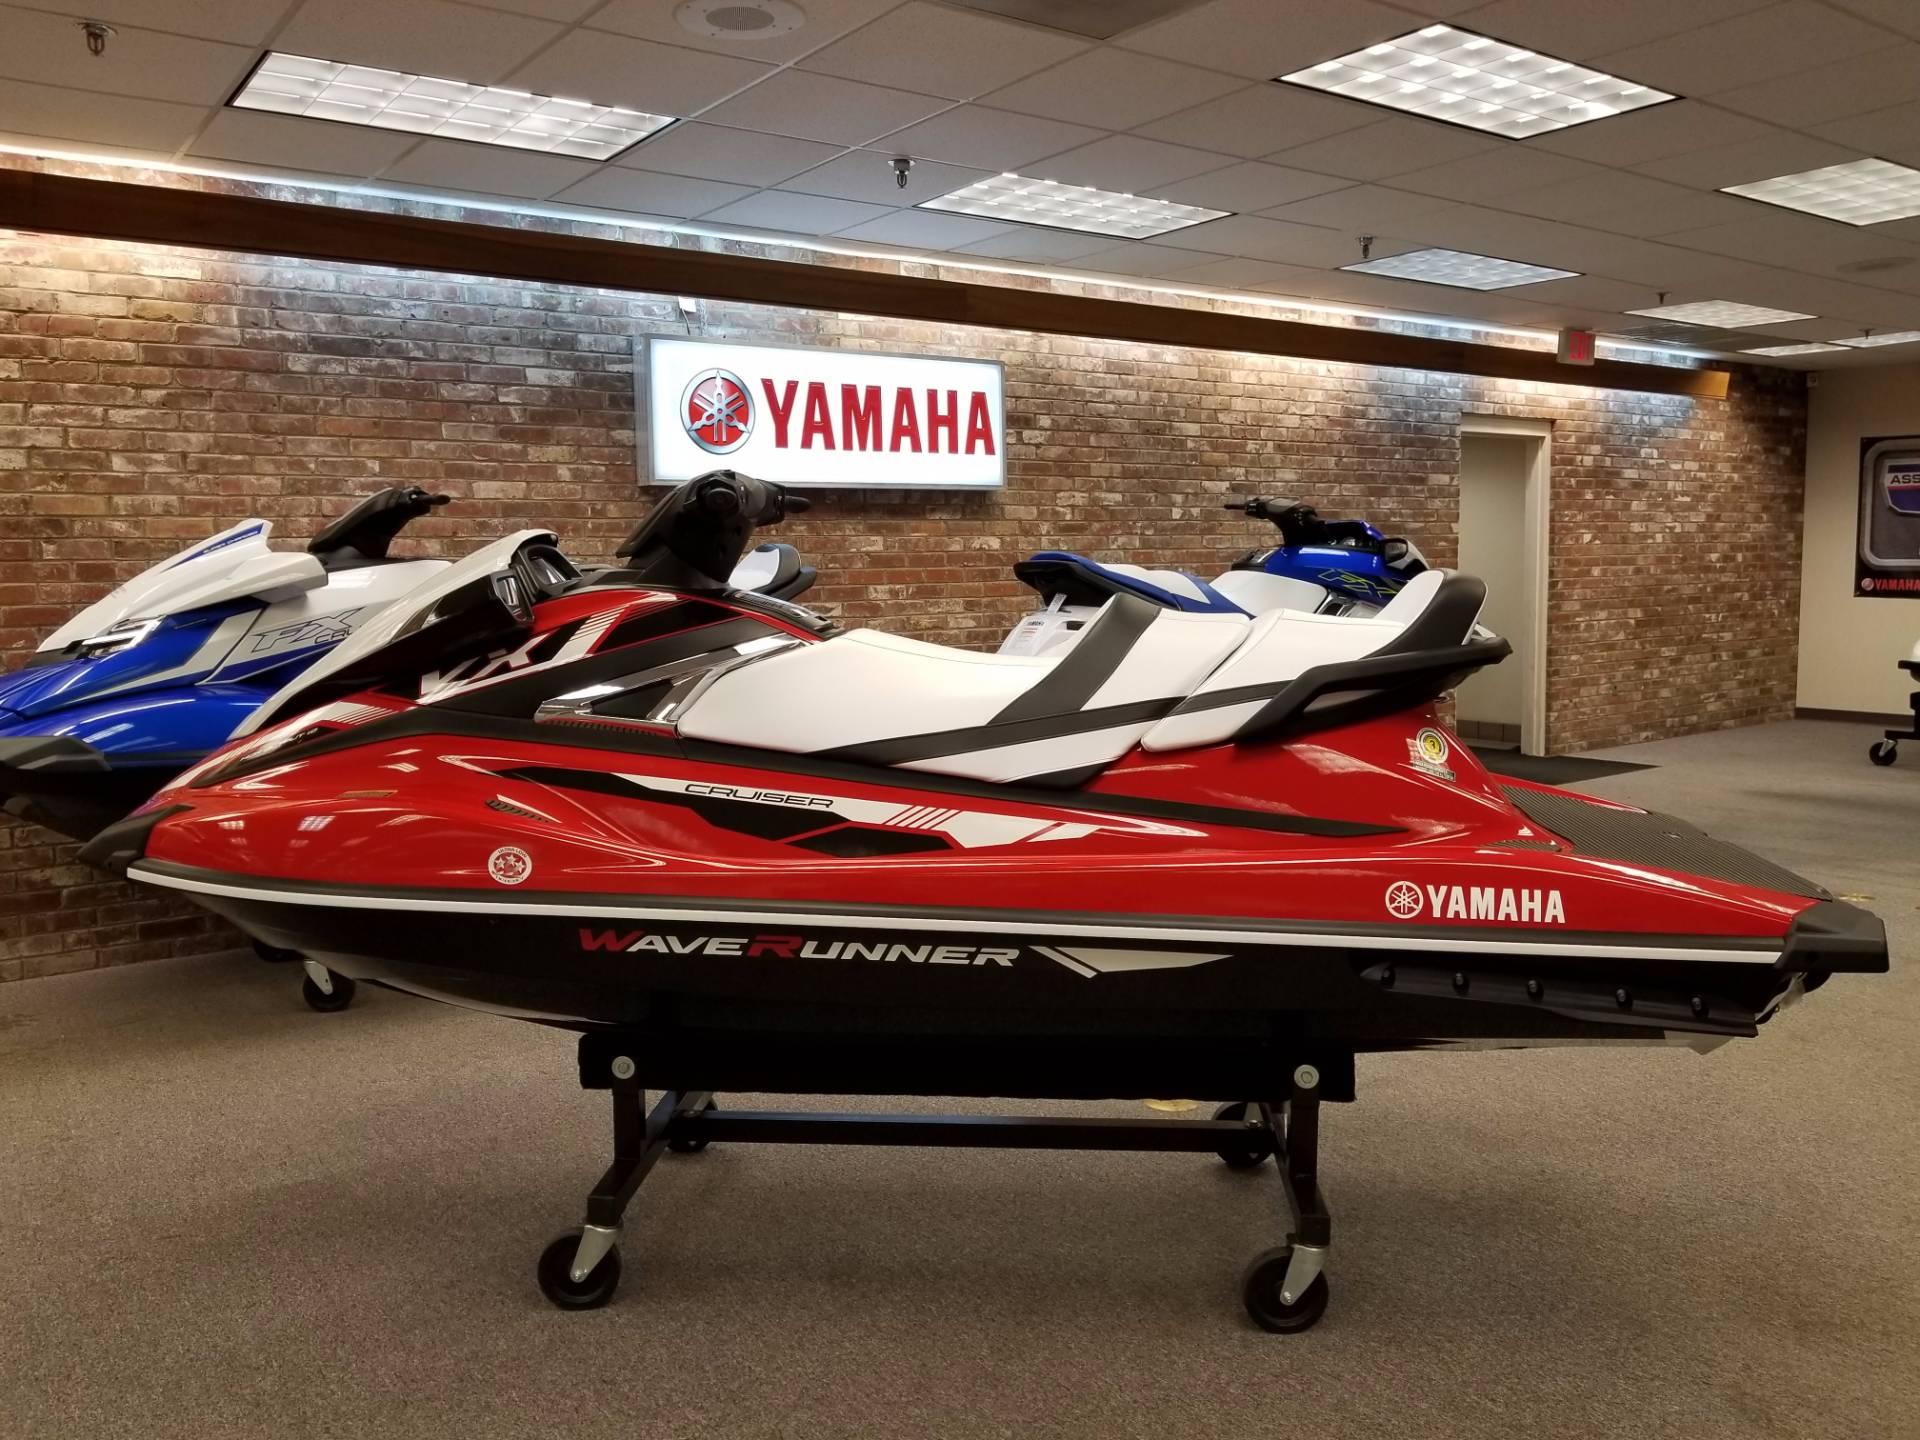 New 2018 Yamaha VX Cruiser Watercraft in Statesville NC